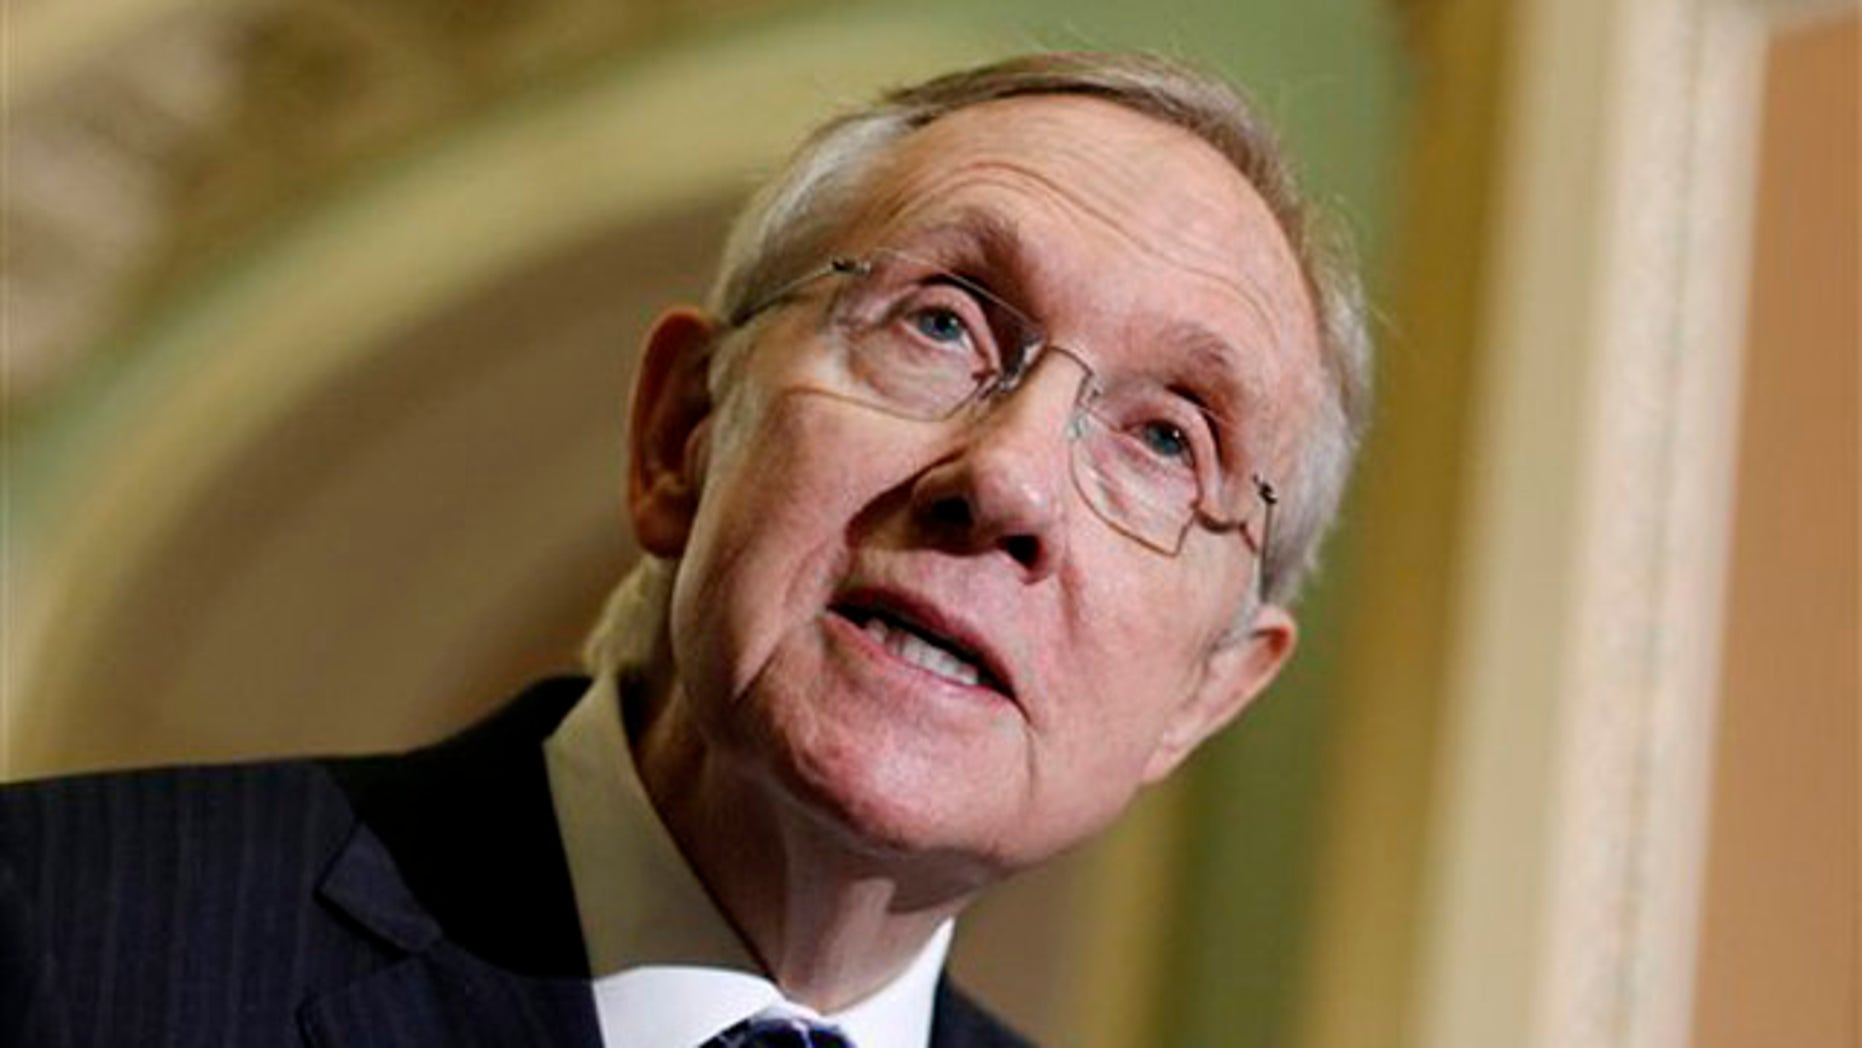 FILE: Senate Majority Leader Harry Reid talks to reporters Oct. 12 on Capitol Hill.